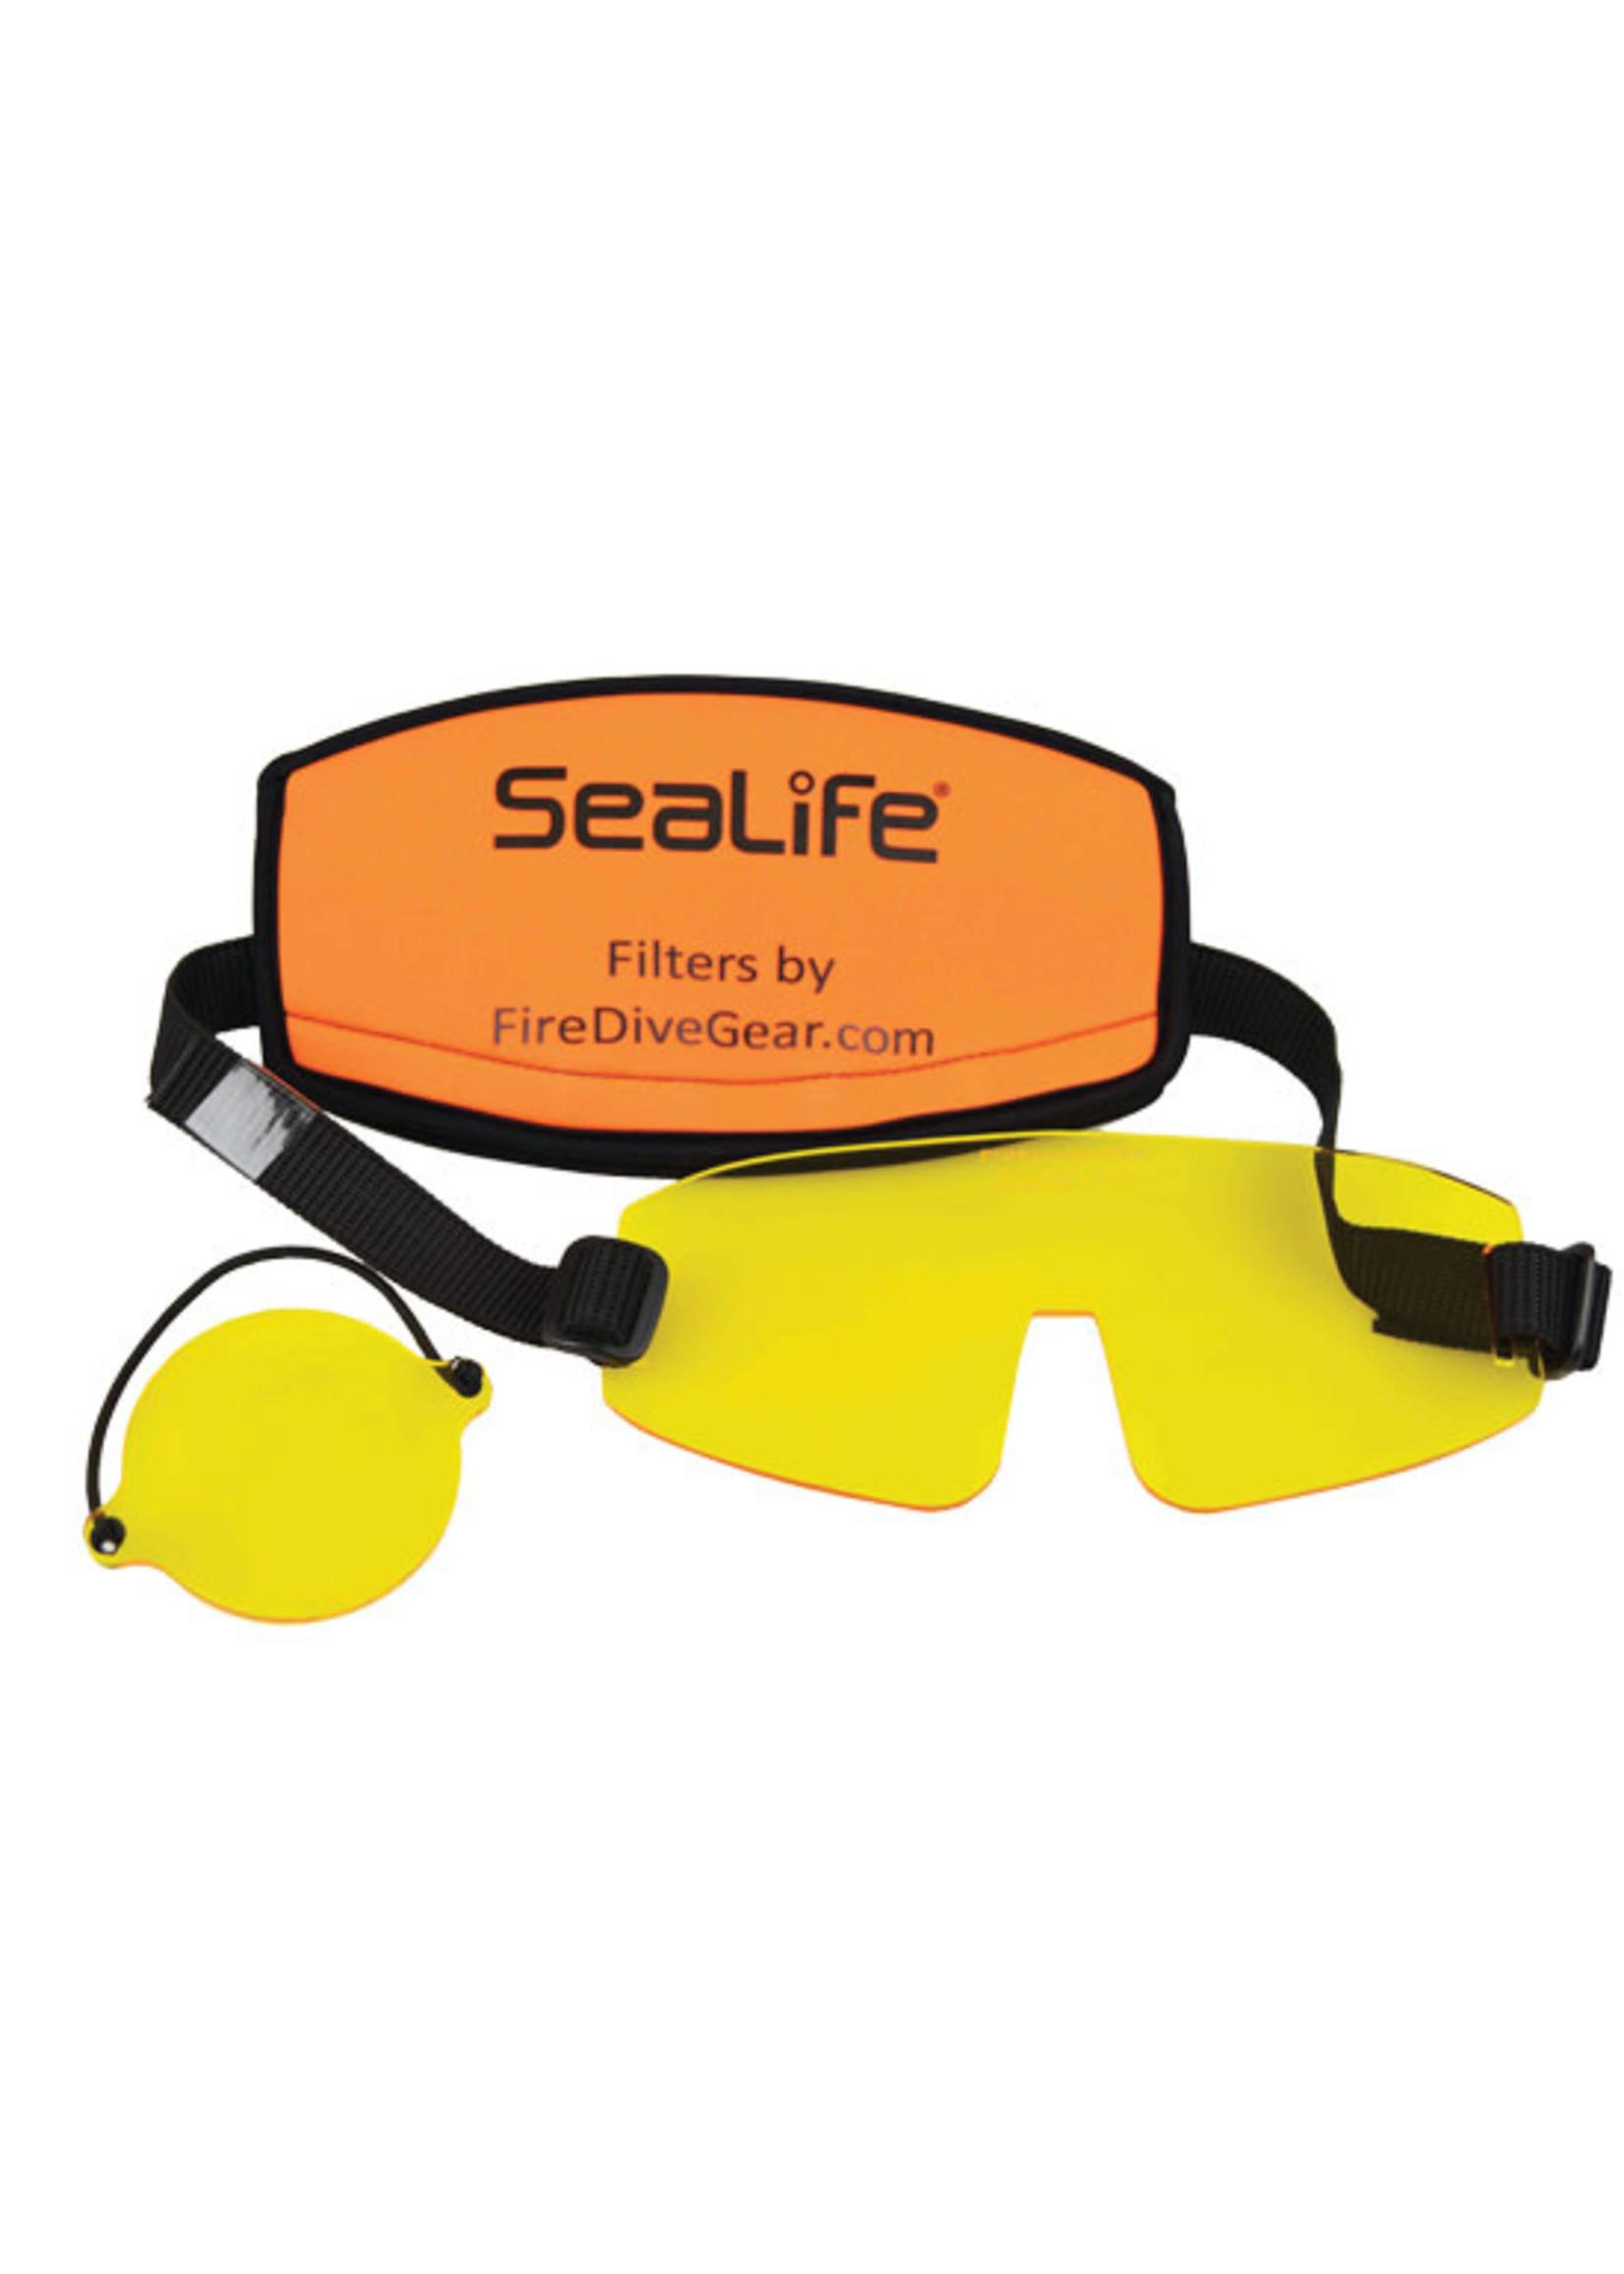 Sealife Sea Dragon Fluoro-Dual Beam